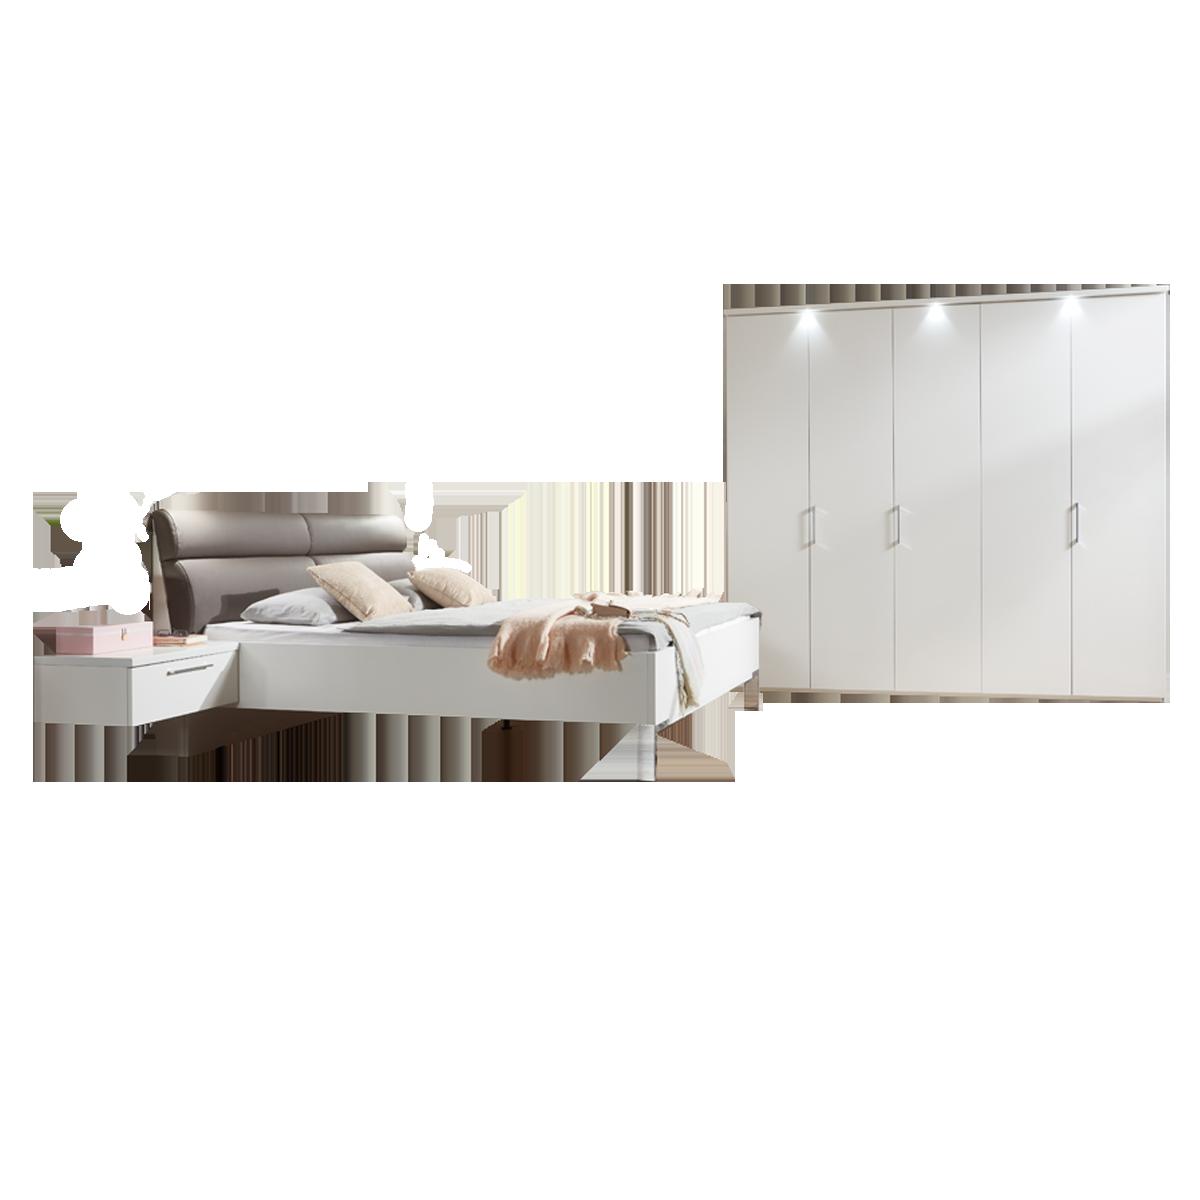 Disselkamp Cd Studioline Schlafzimmer Doppelbett Nachtkonsole Schrank